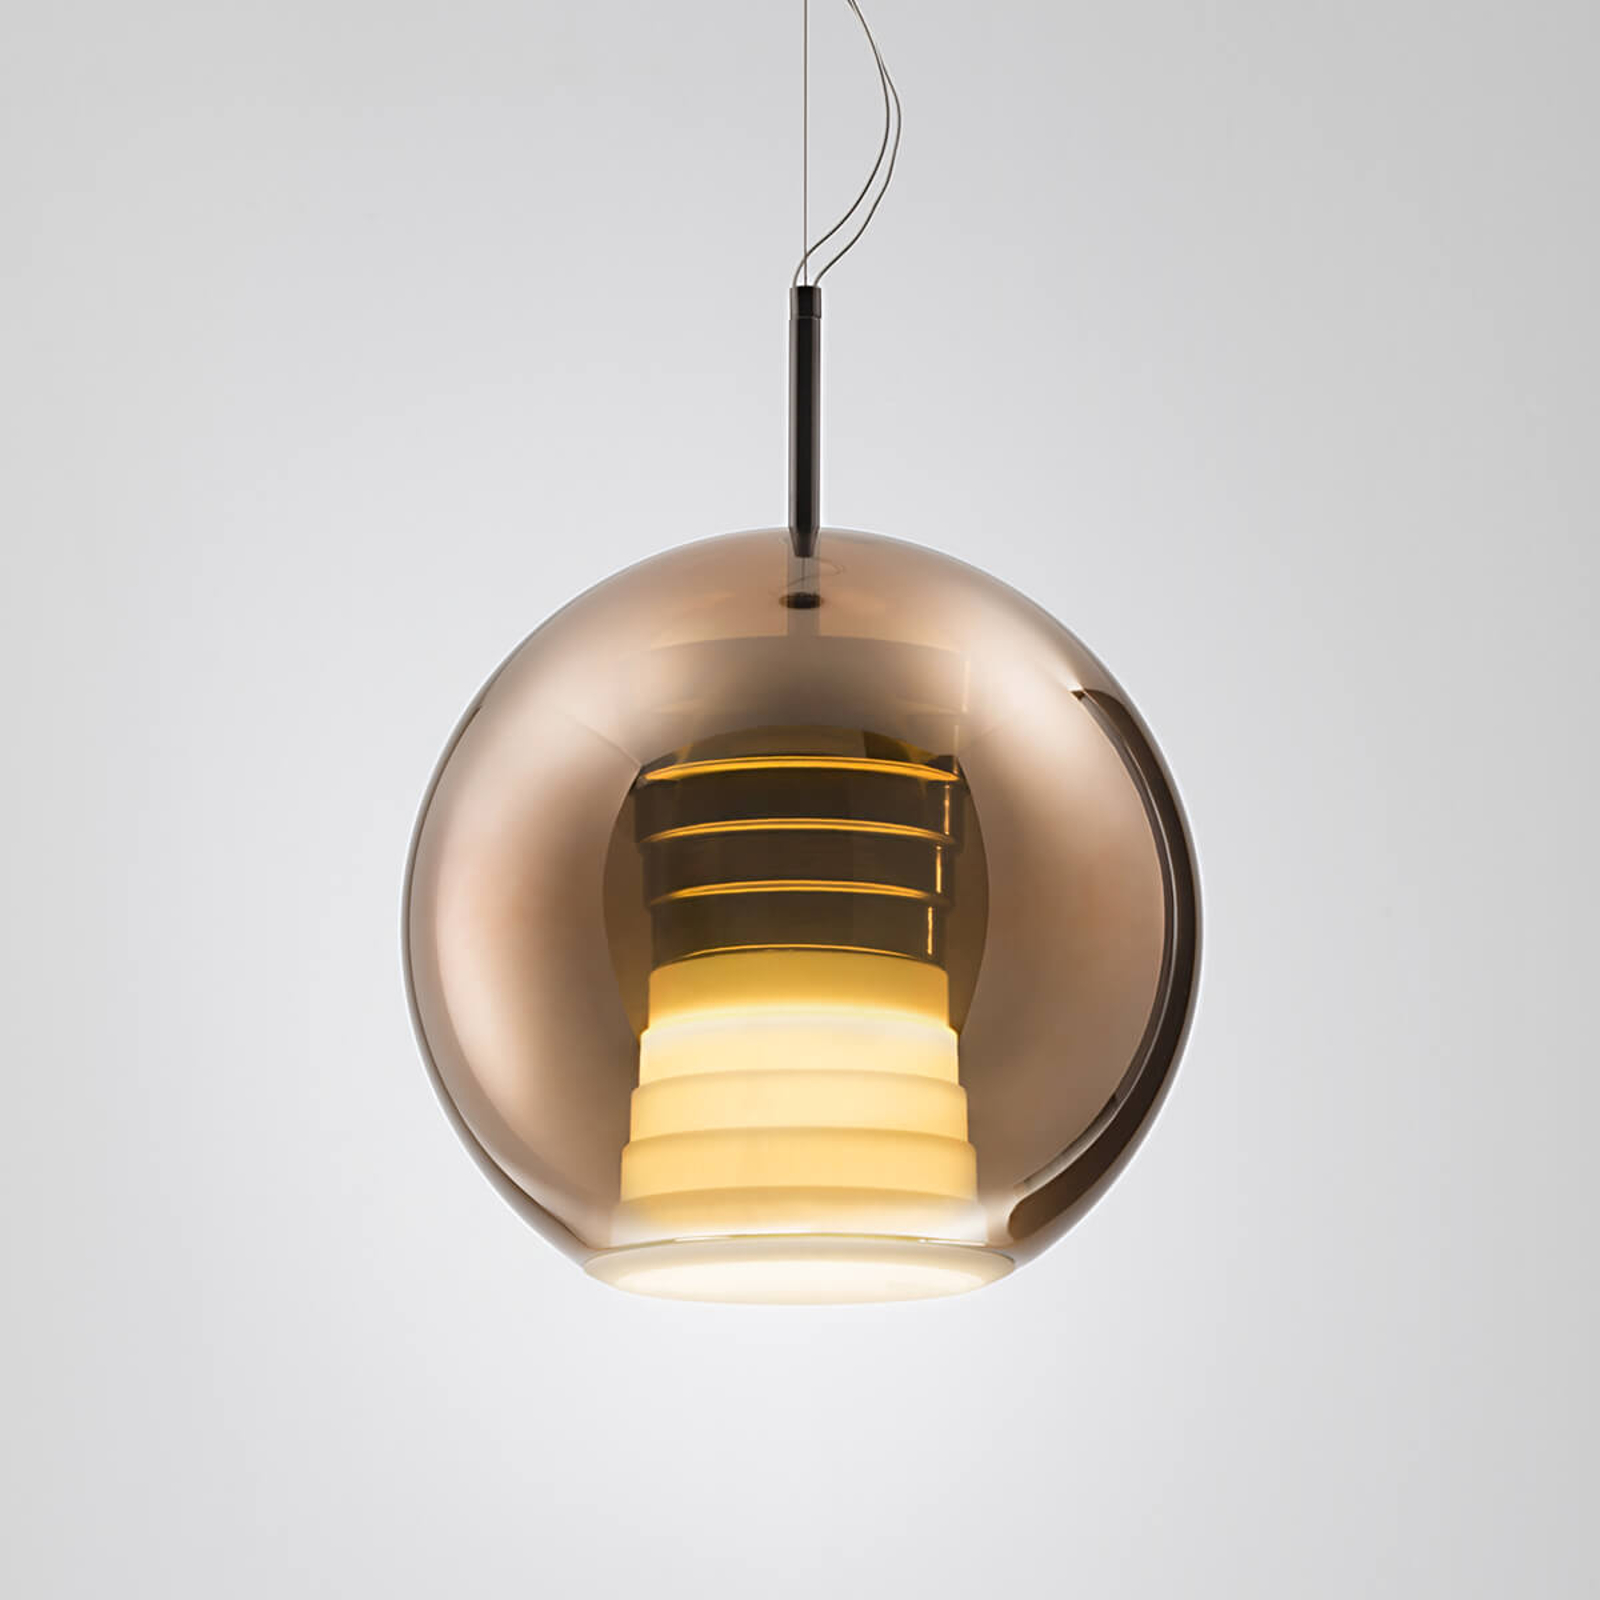 Glazen hanglamp Beluga Royal met LED's, koper